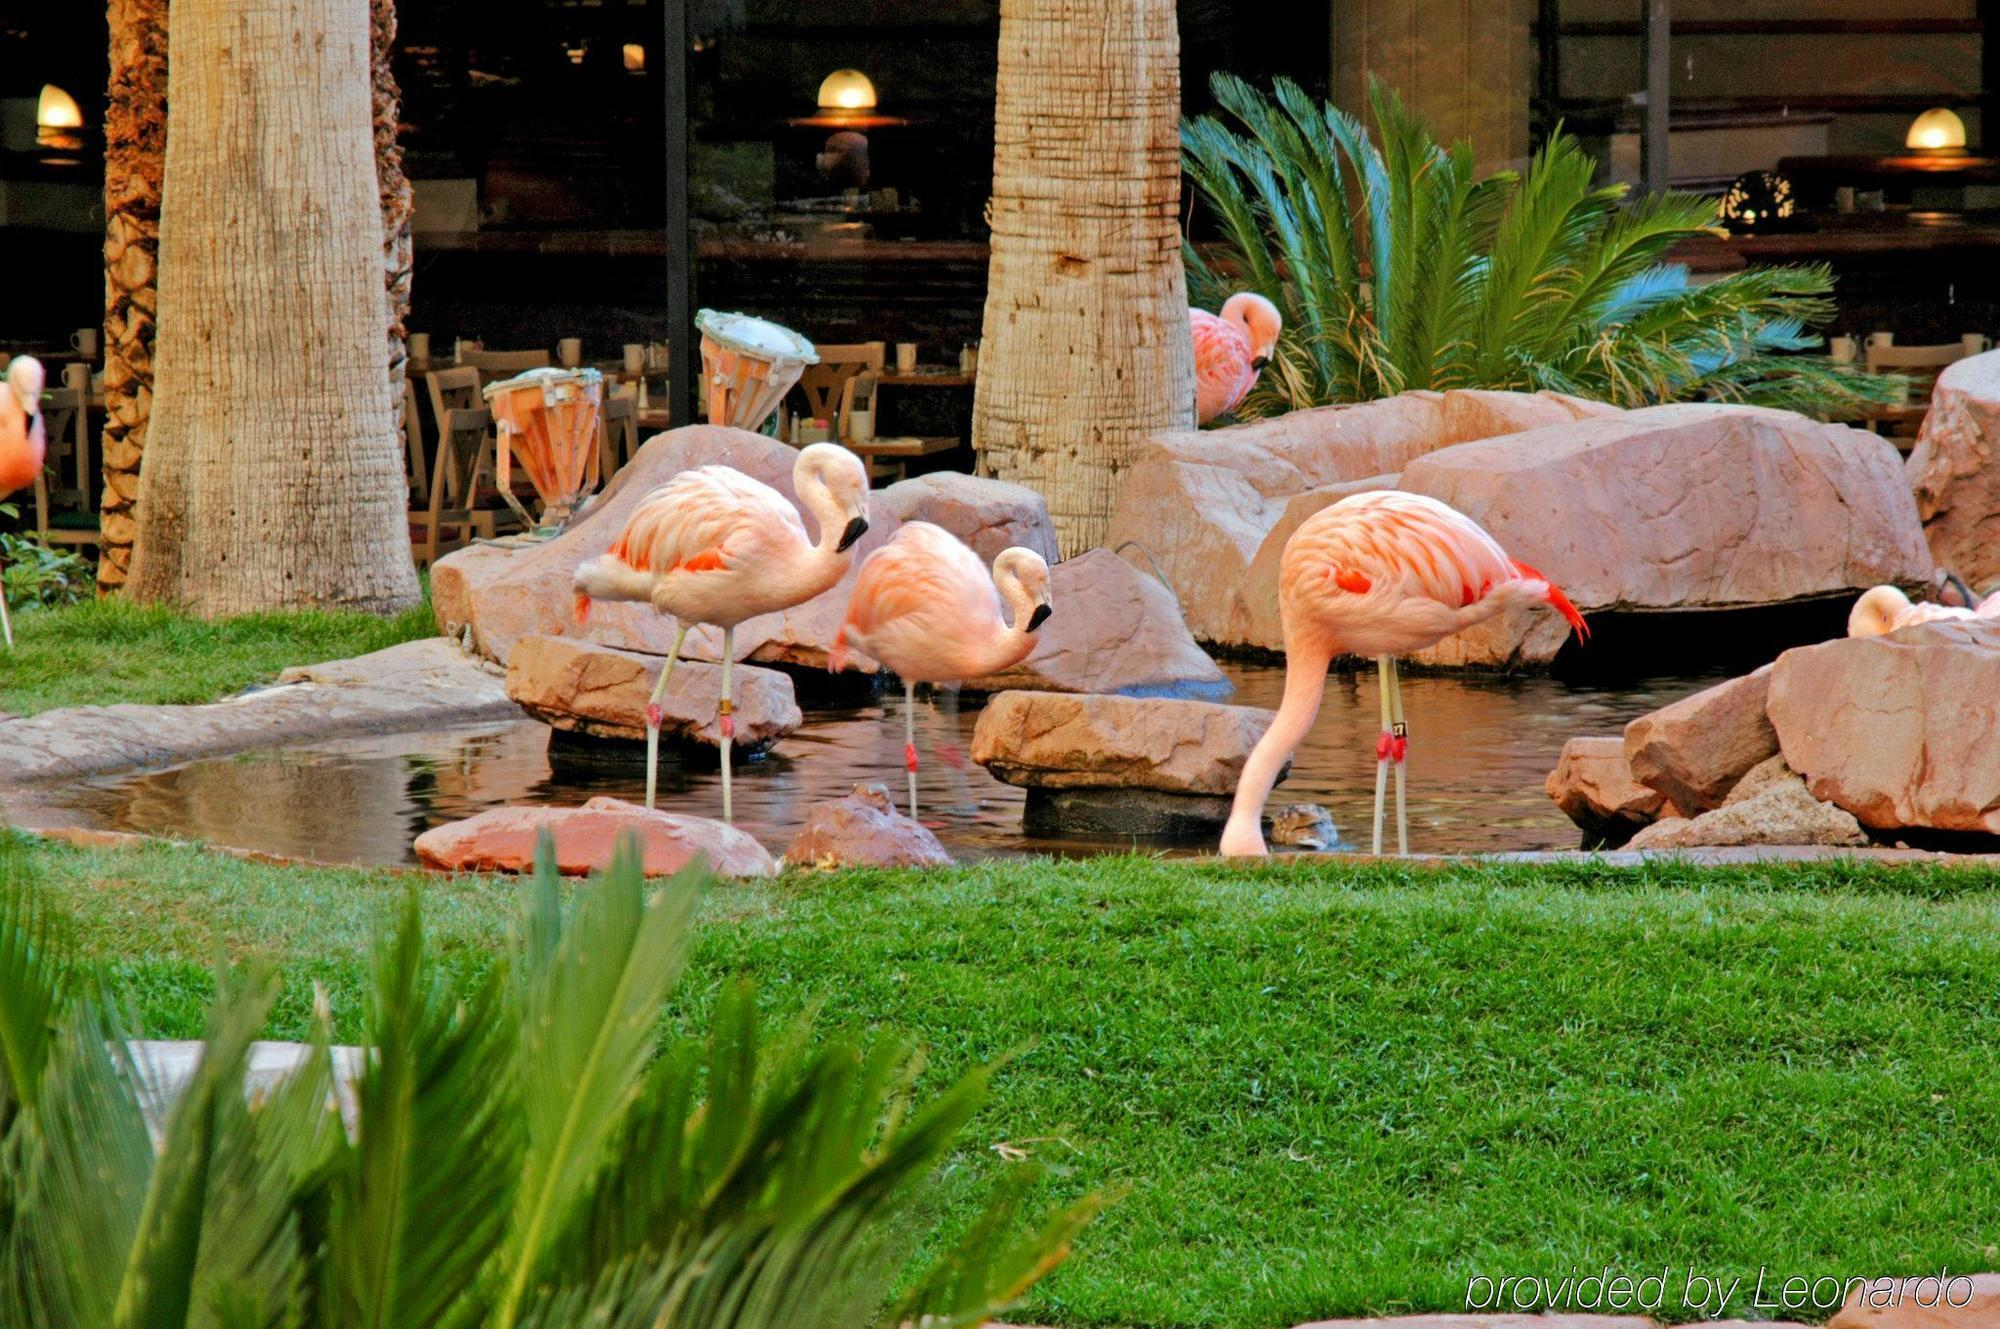 Hotel flamingo las vegas las vegas for Yard statues las vegas